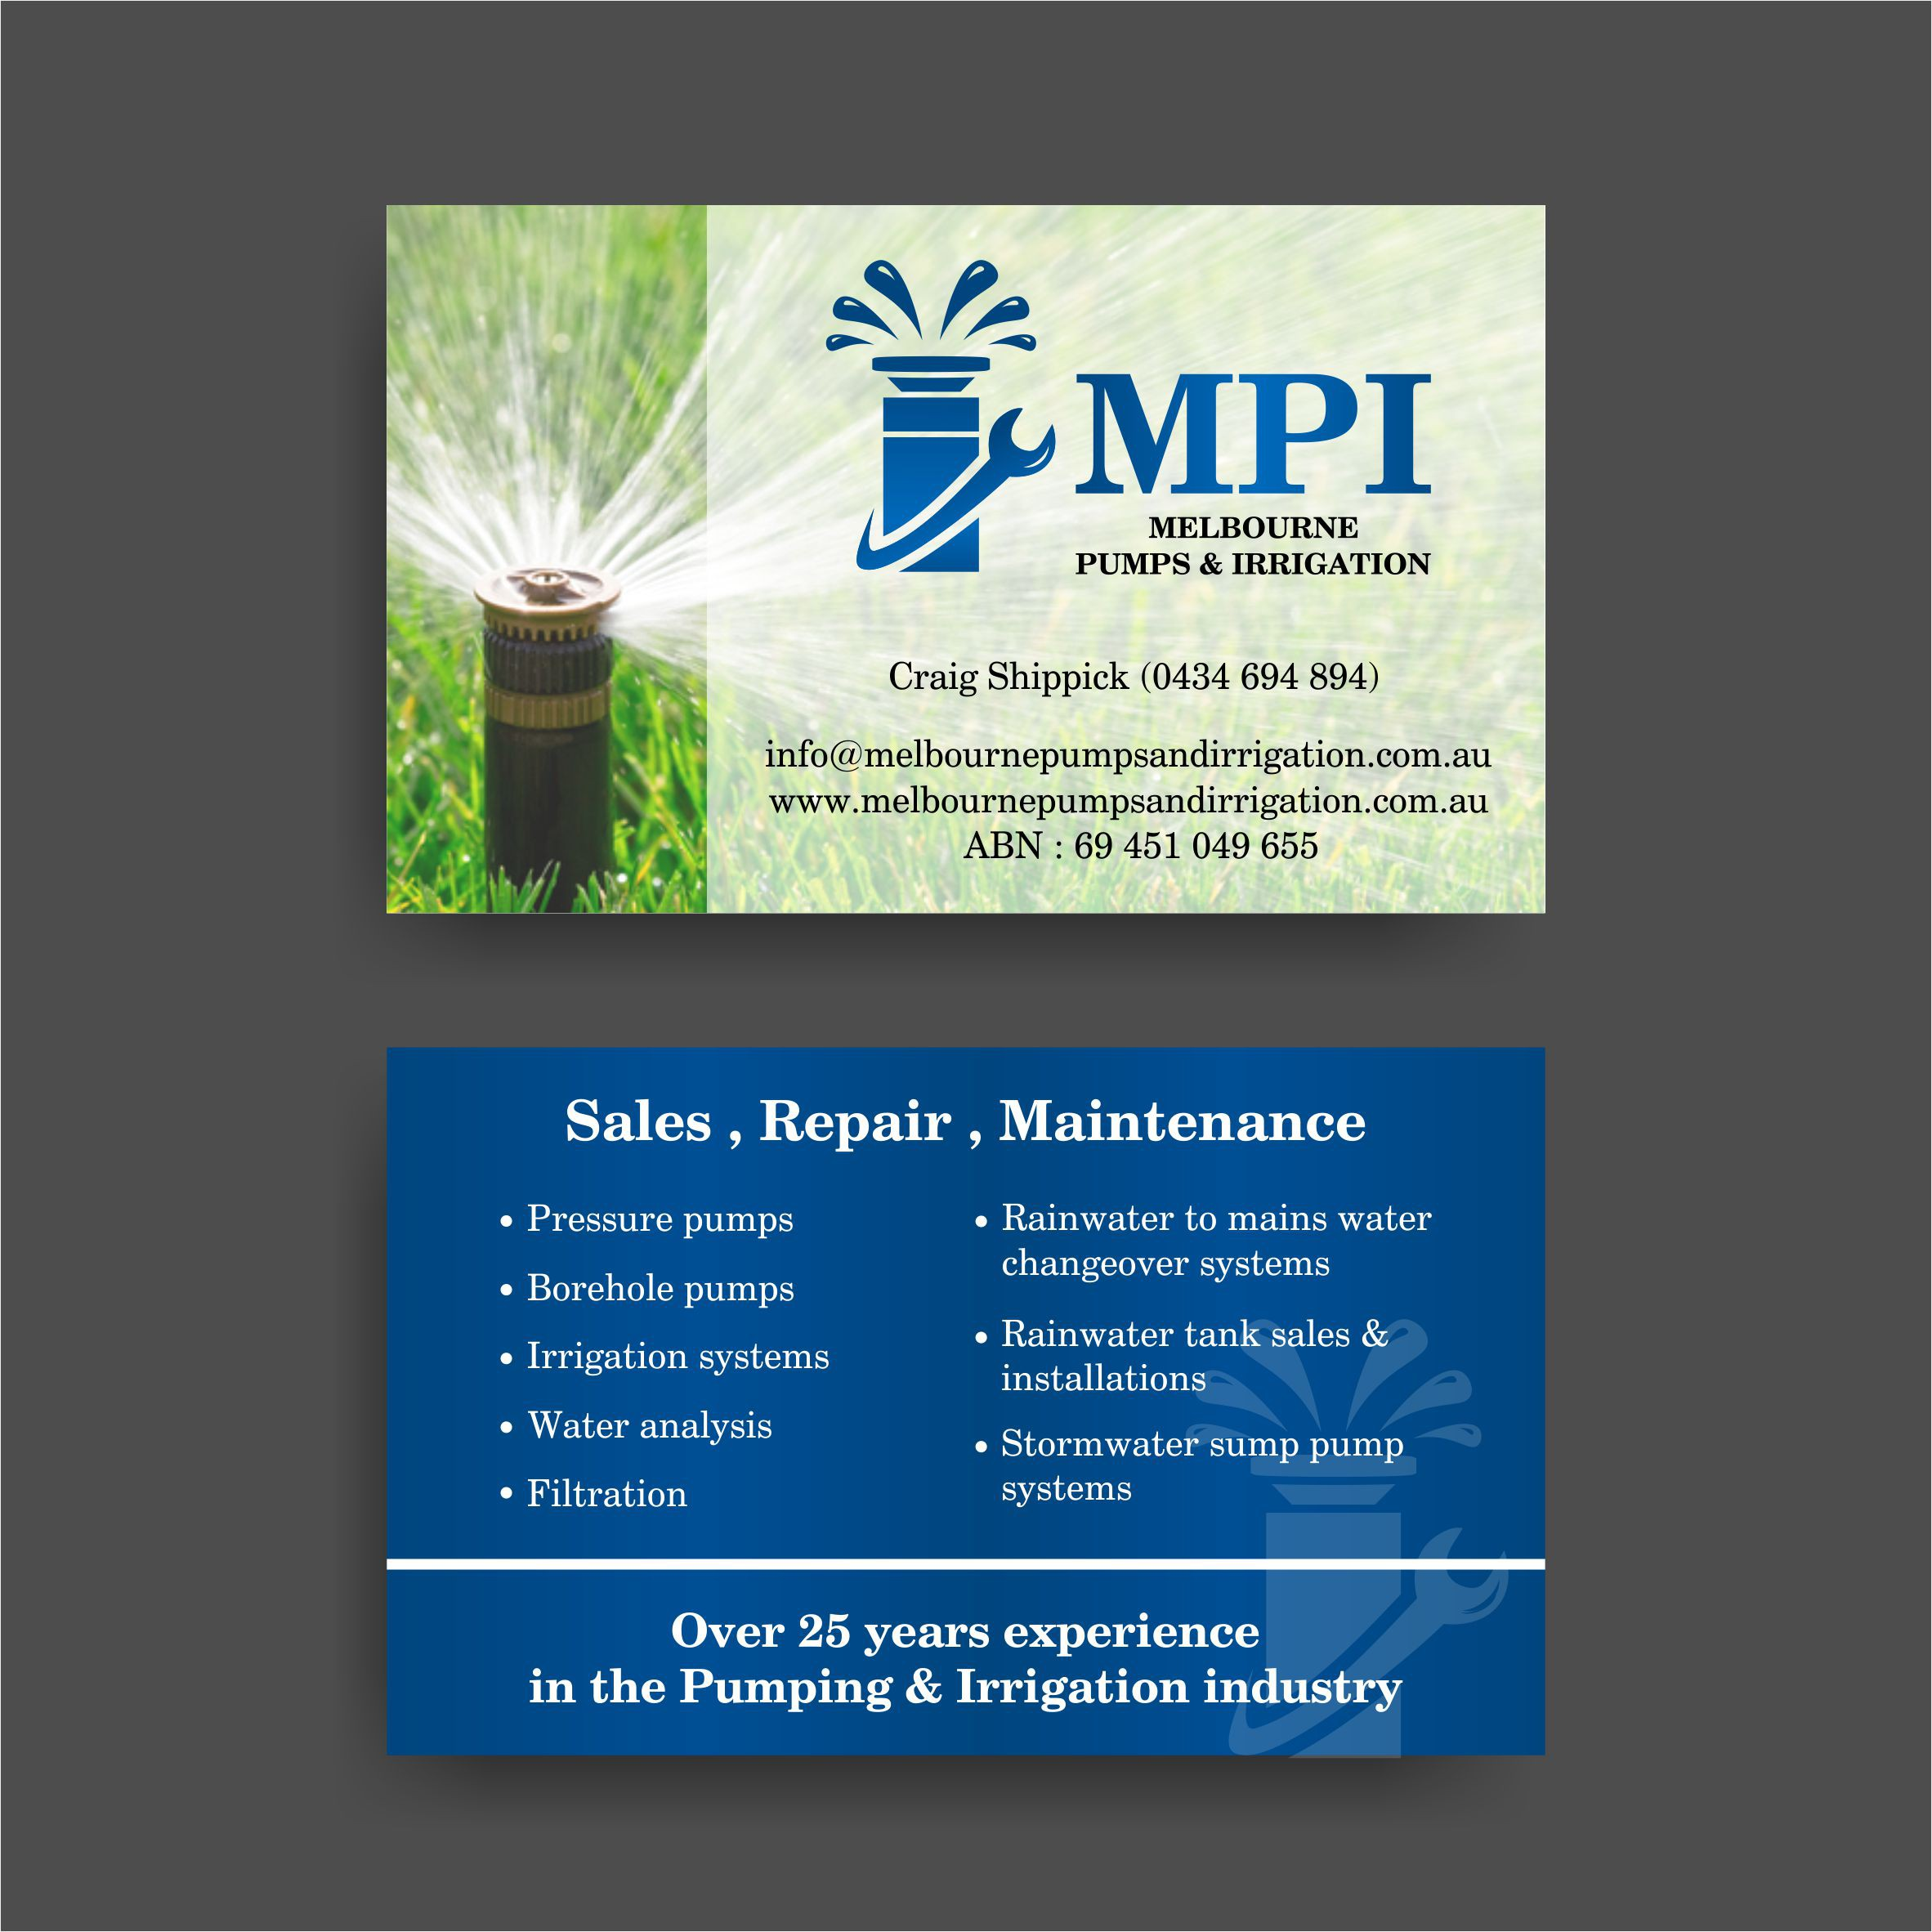 Business Card for Melbourne Pumps & Irrigation